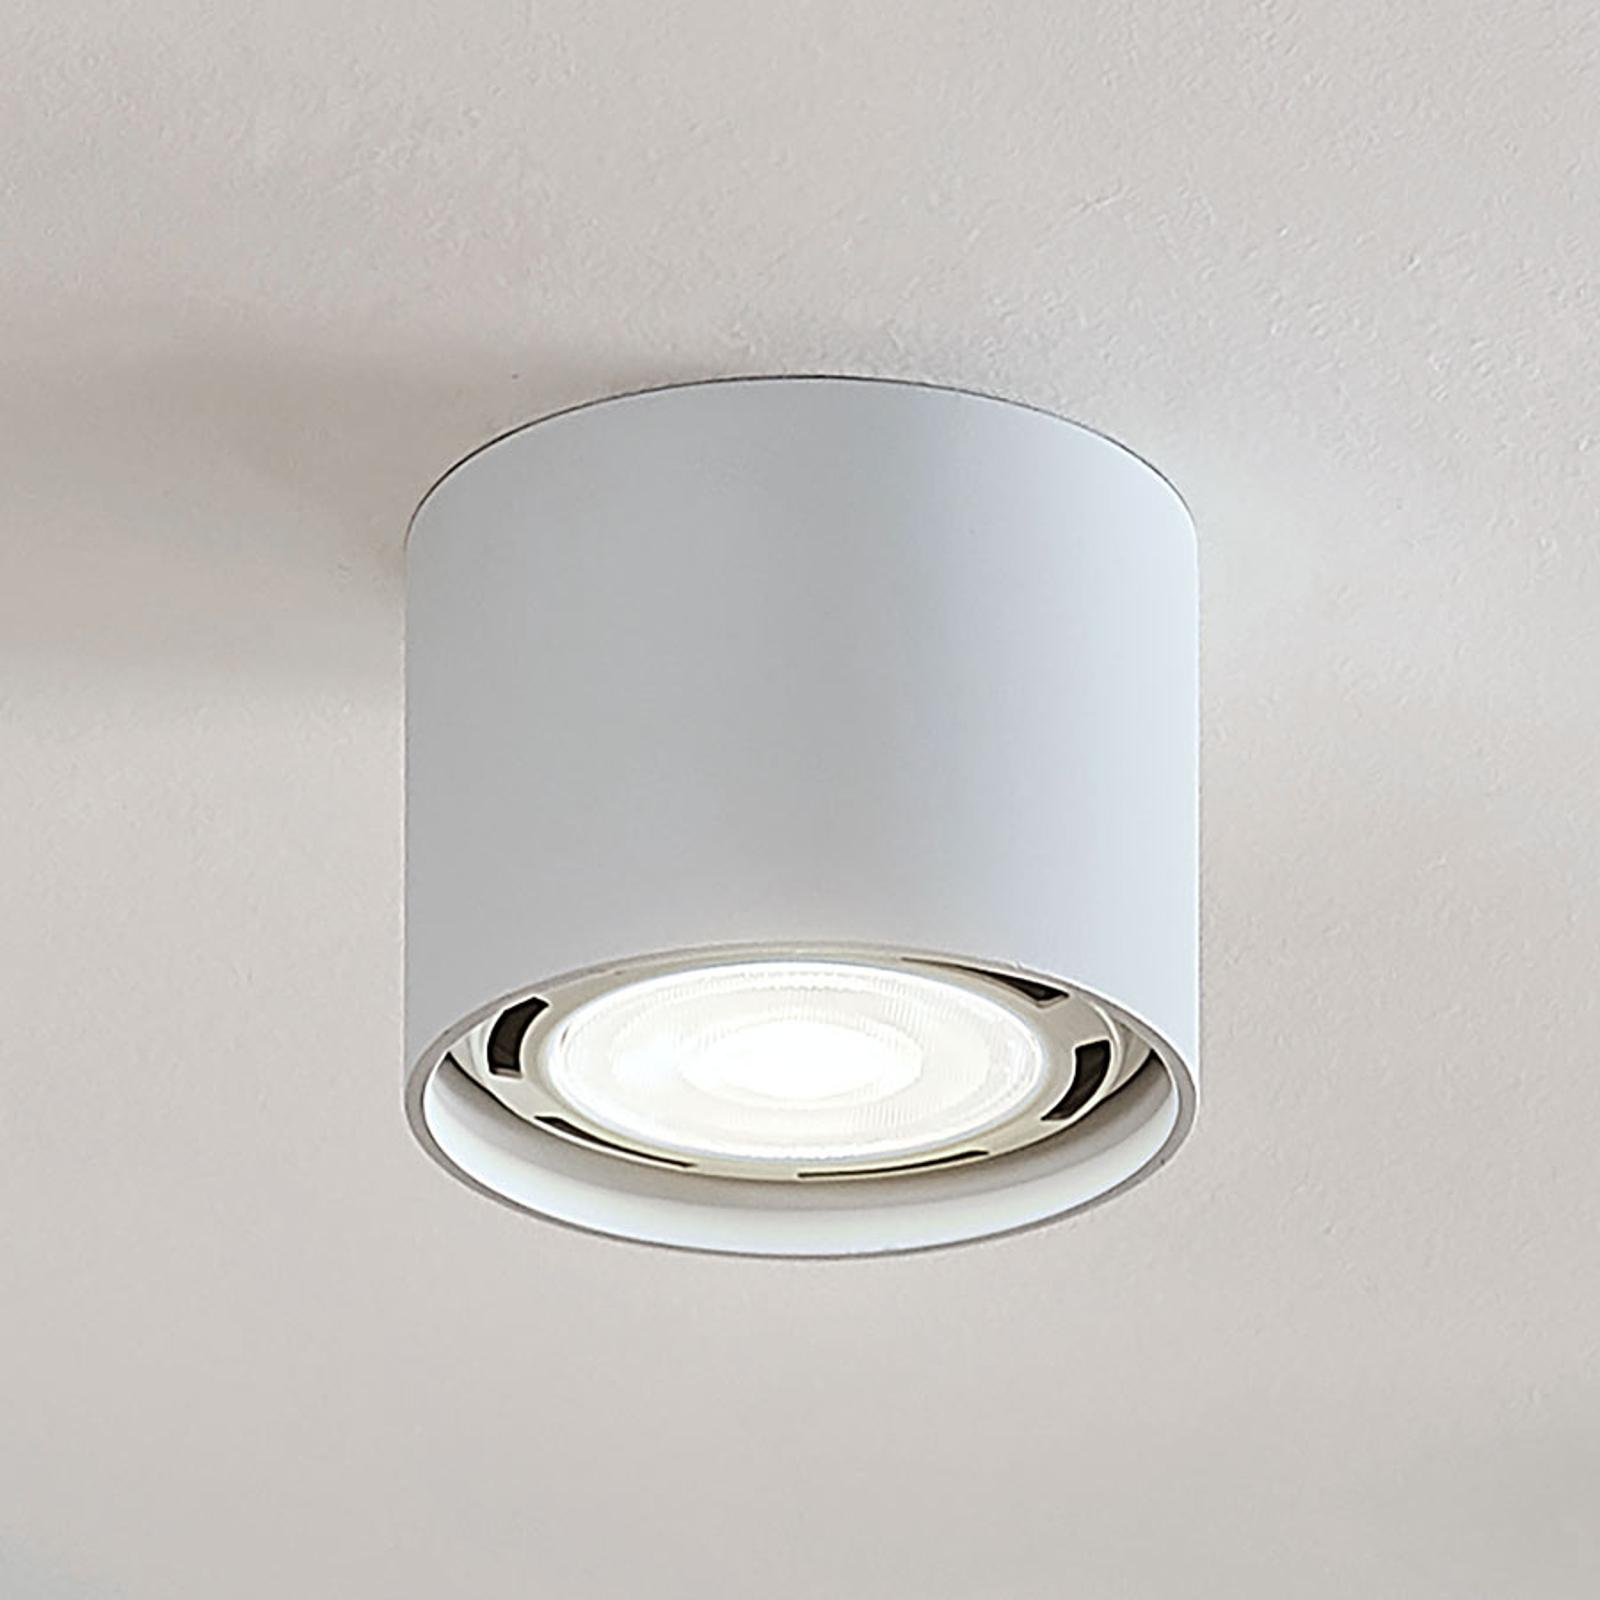 Spot sufitowy LED Mabel, okrągły, biały